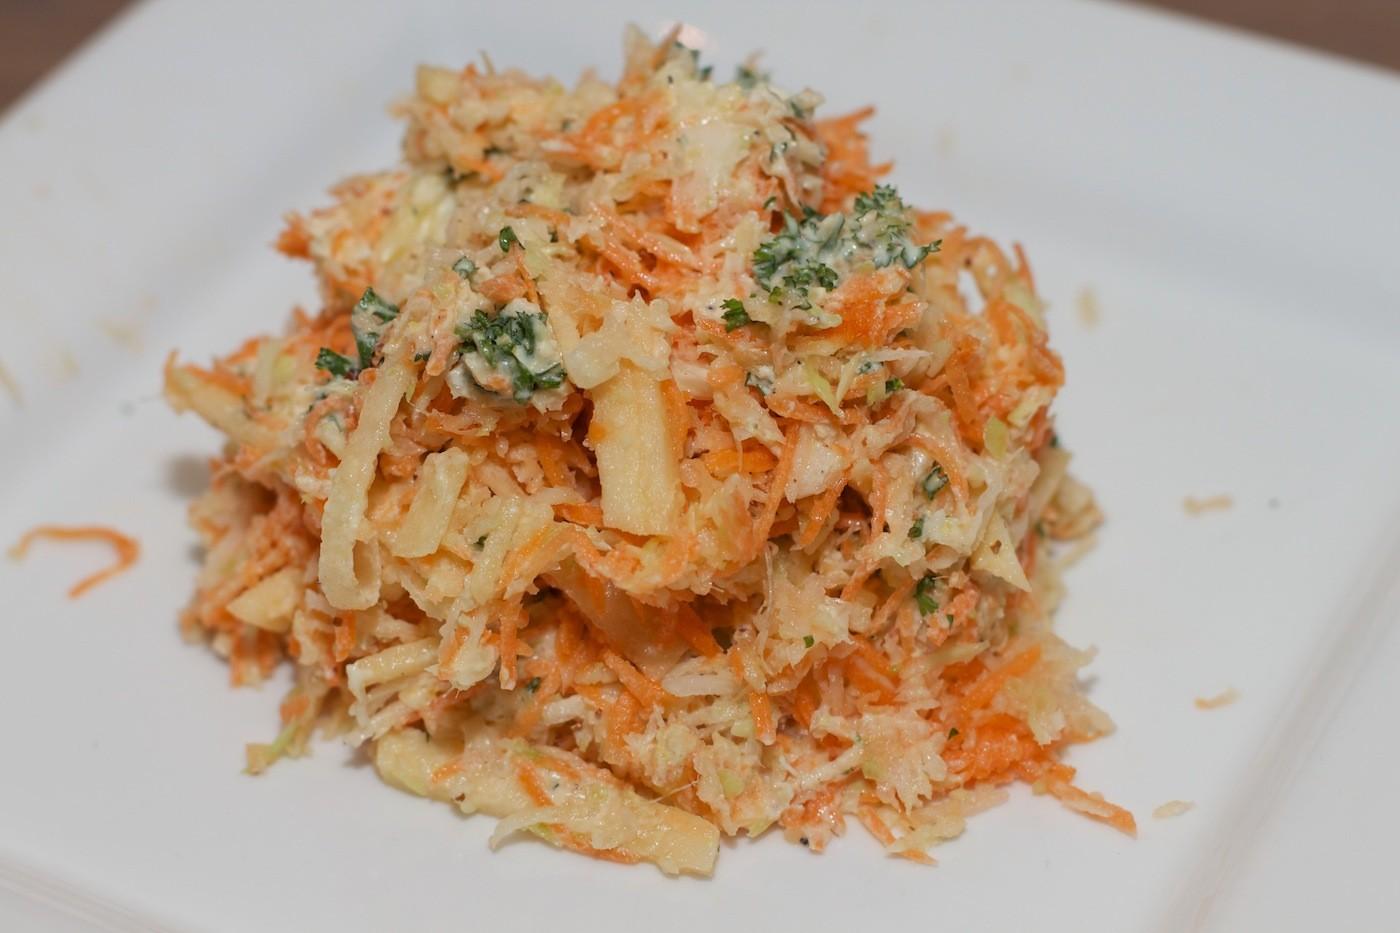 Koolsalade (coleslaw)